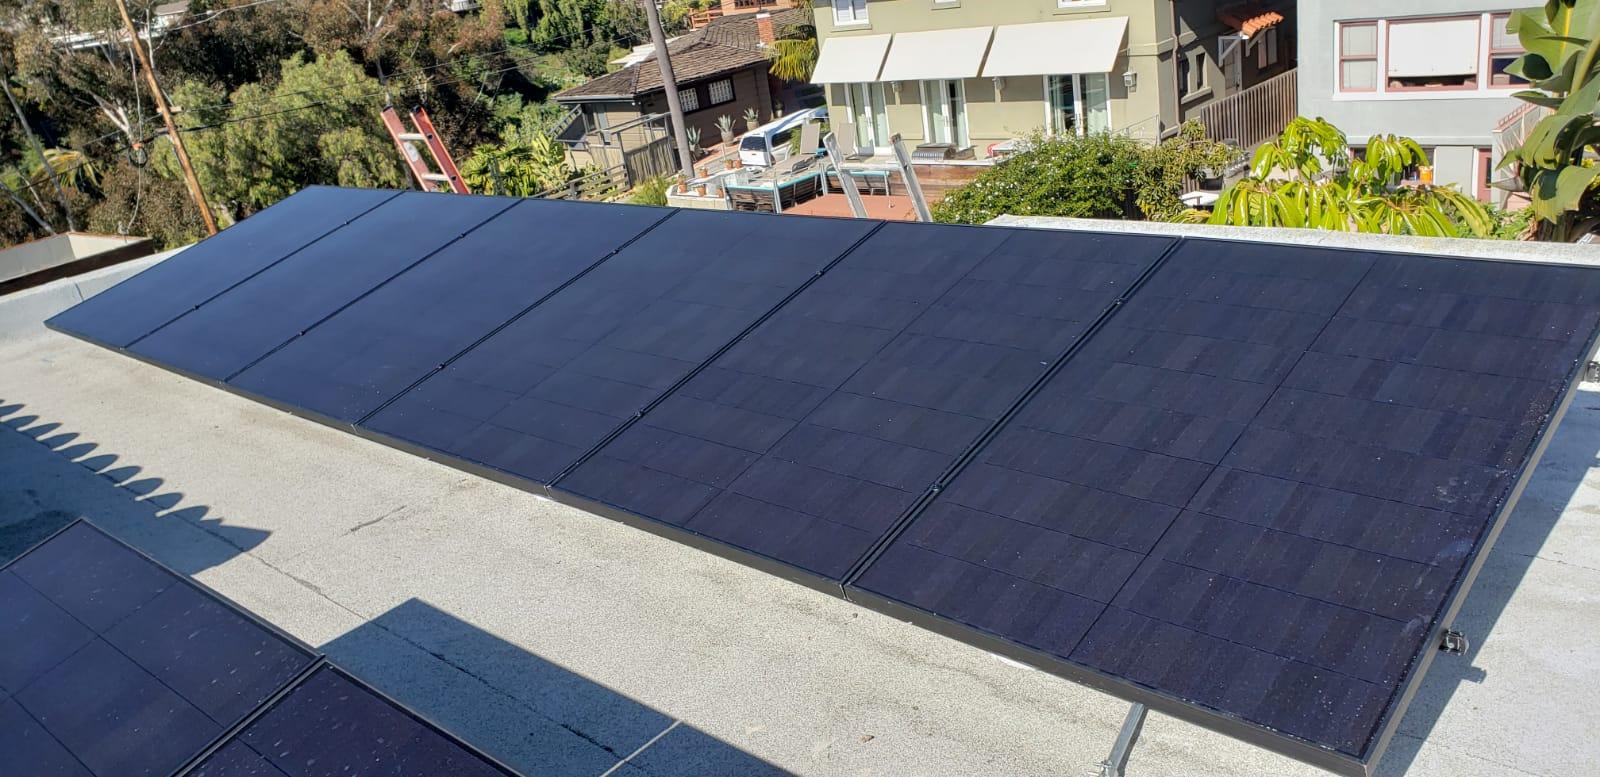 Sunlight Solar System Installation San Diego Image 2